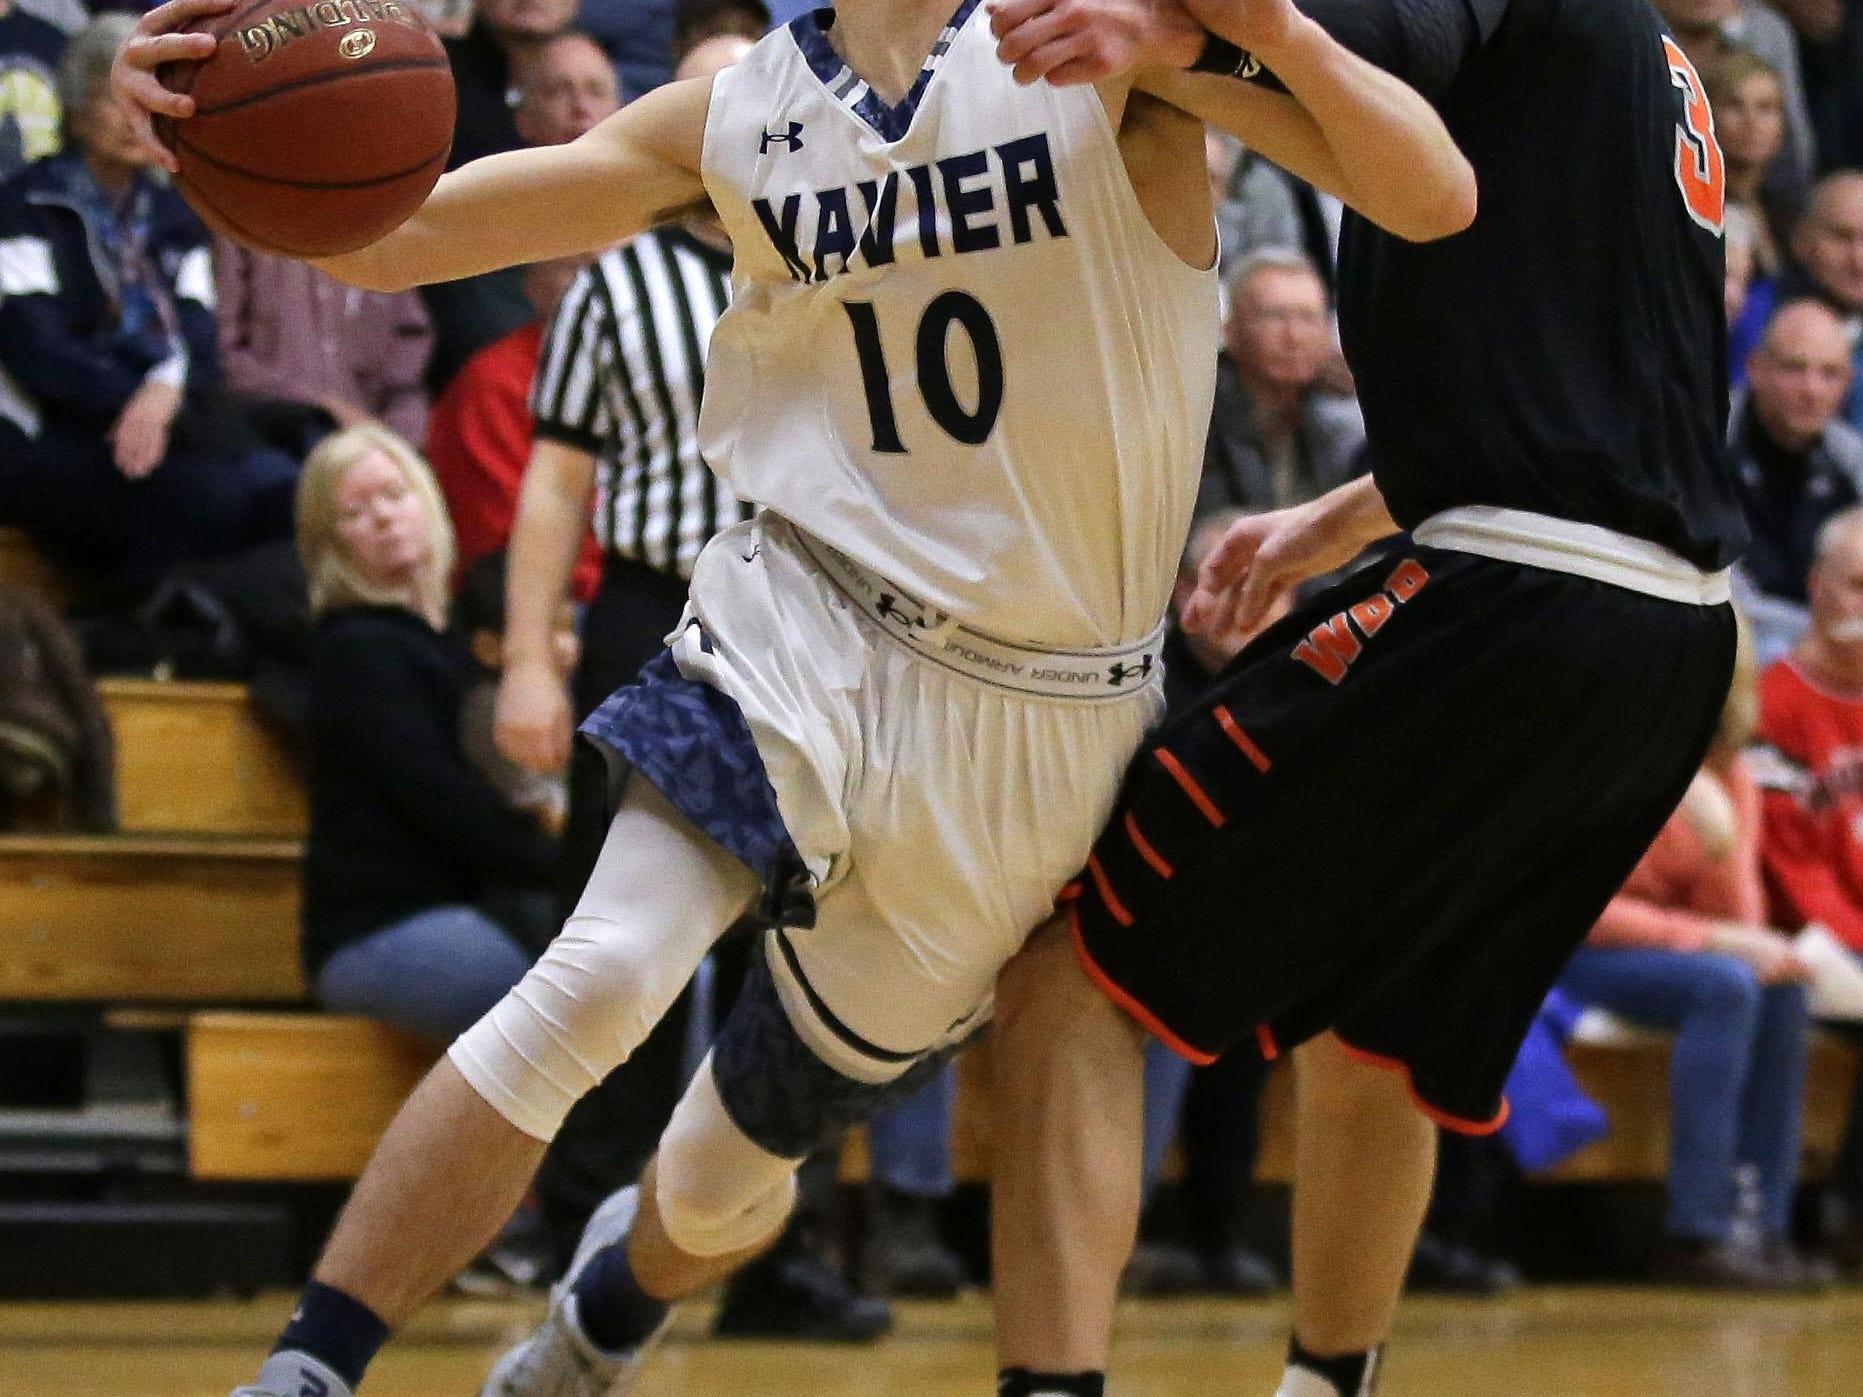 Xavier's Cal Christensen drives to the basket against Tyler Schwartz of West De Pere.